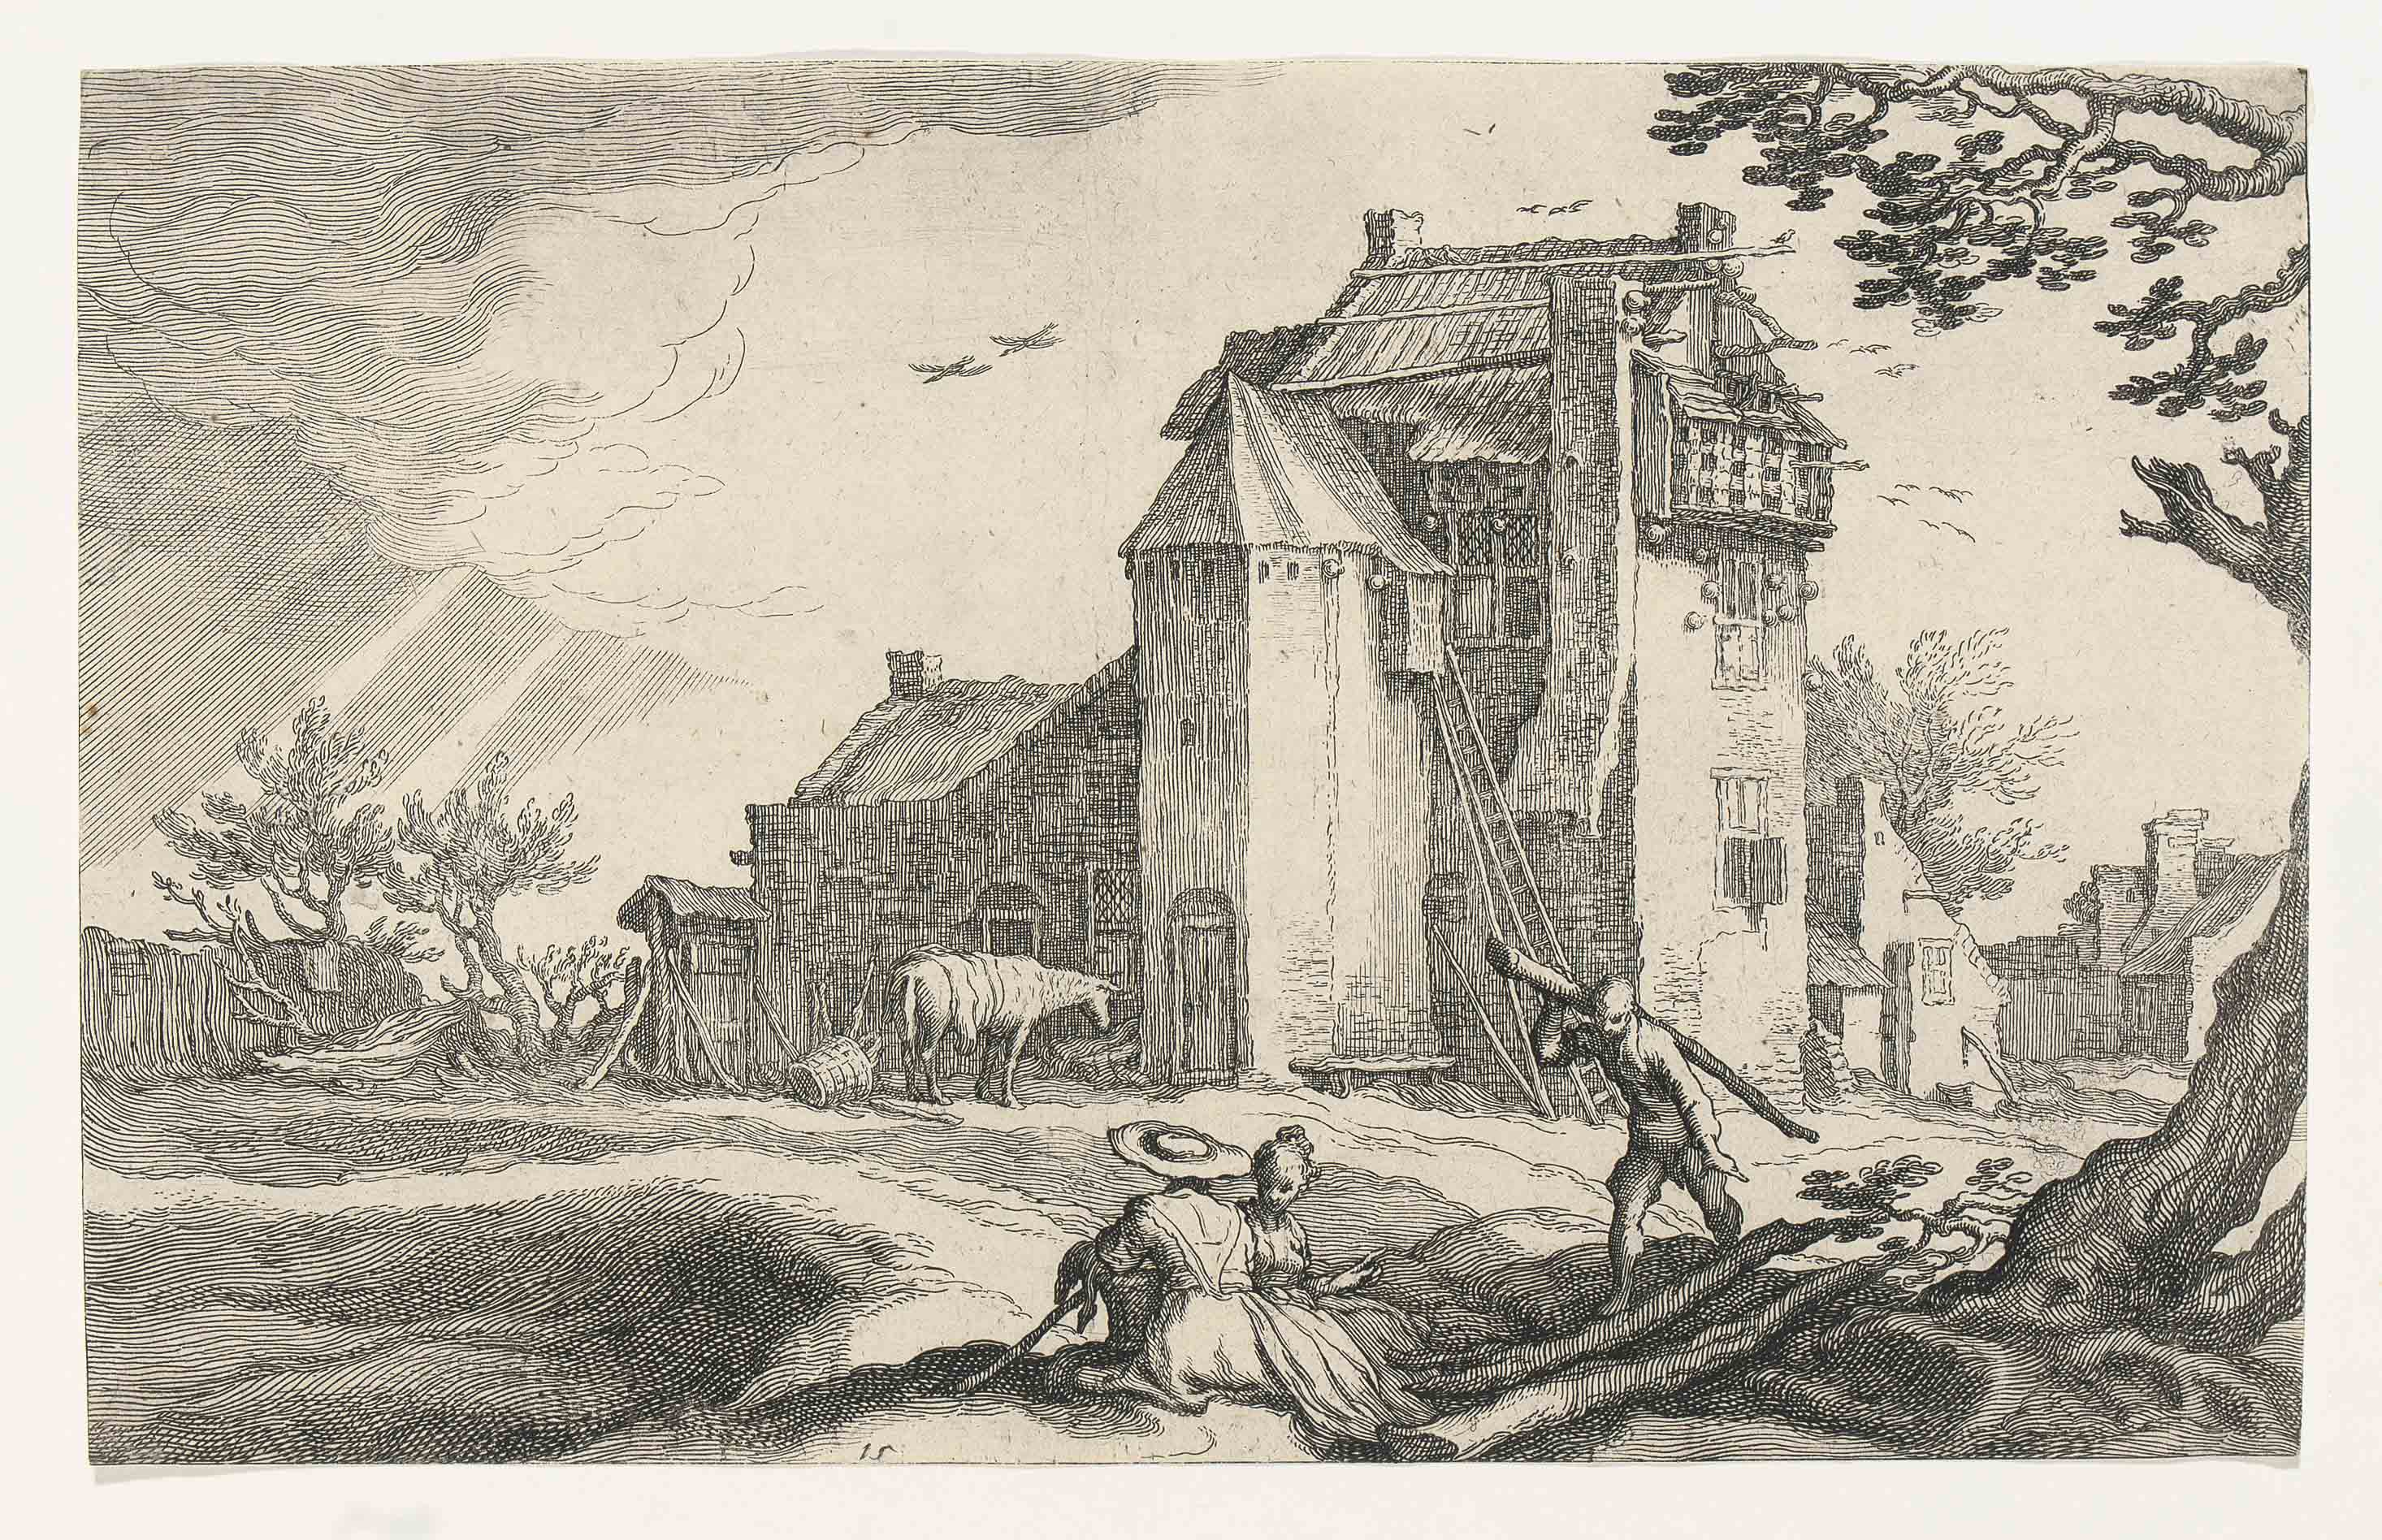 Boetius Adams Bolswert (1580-1